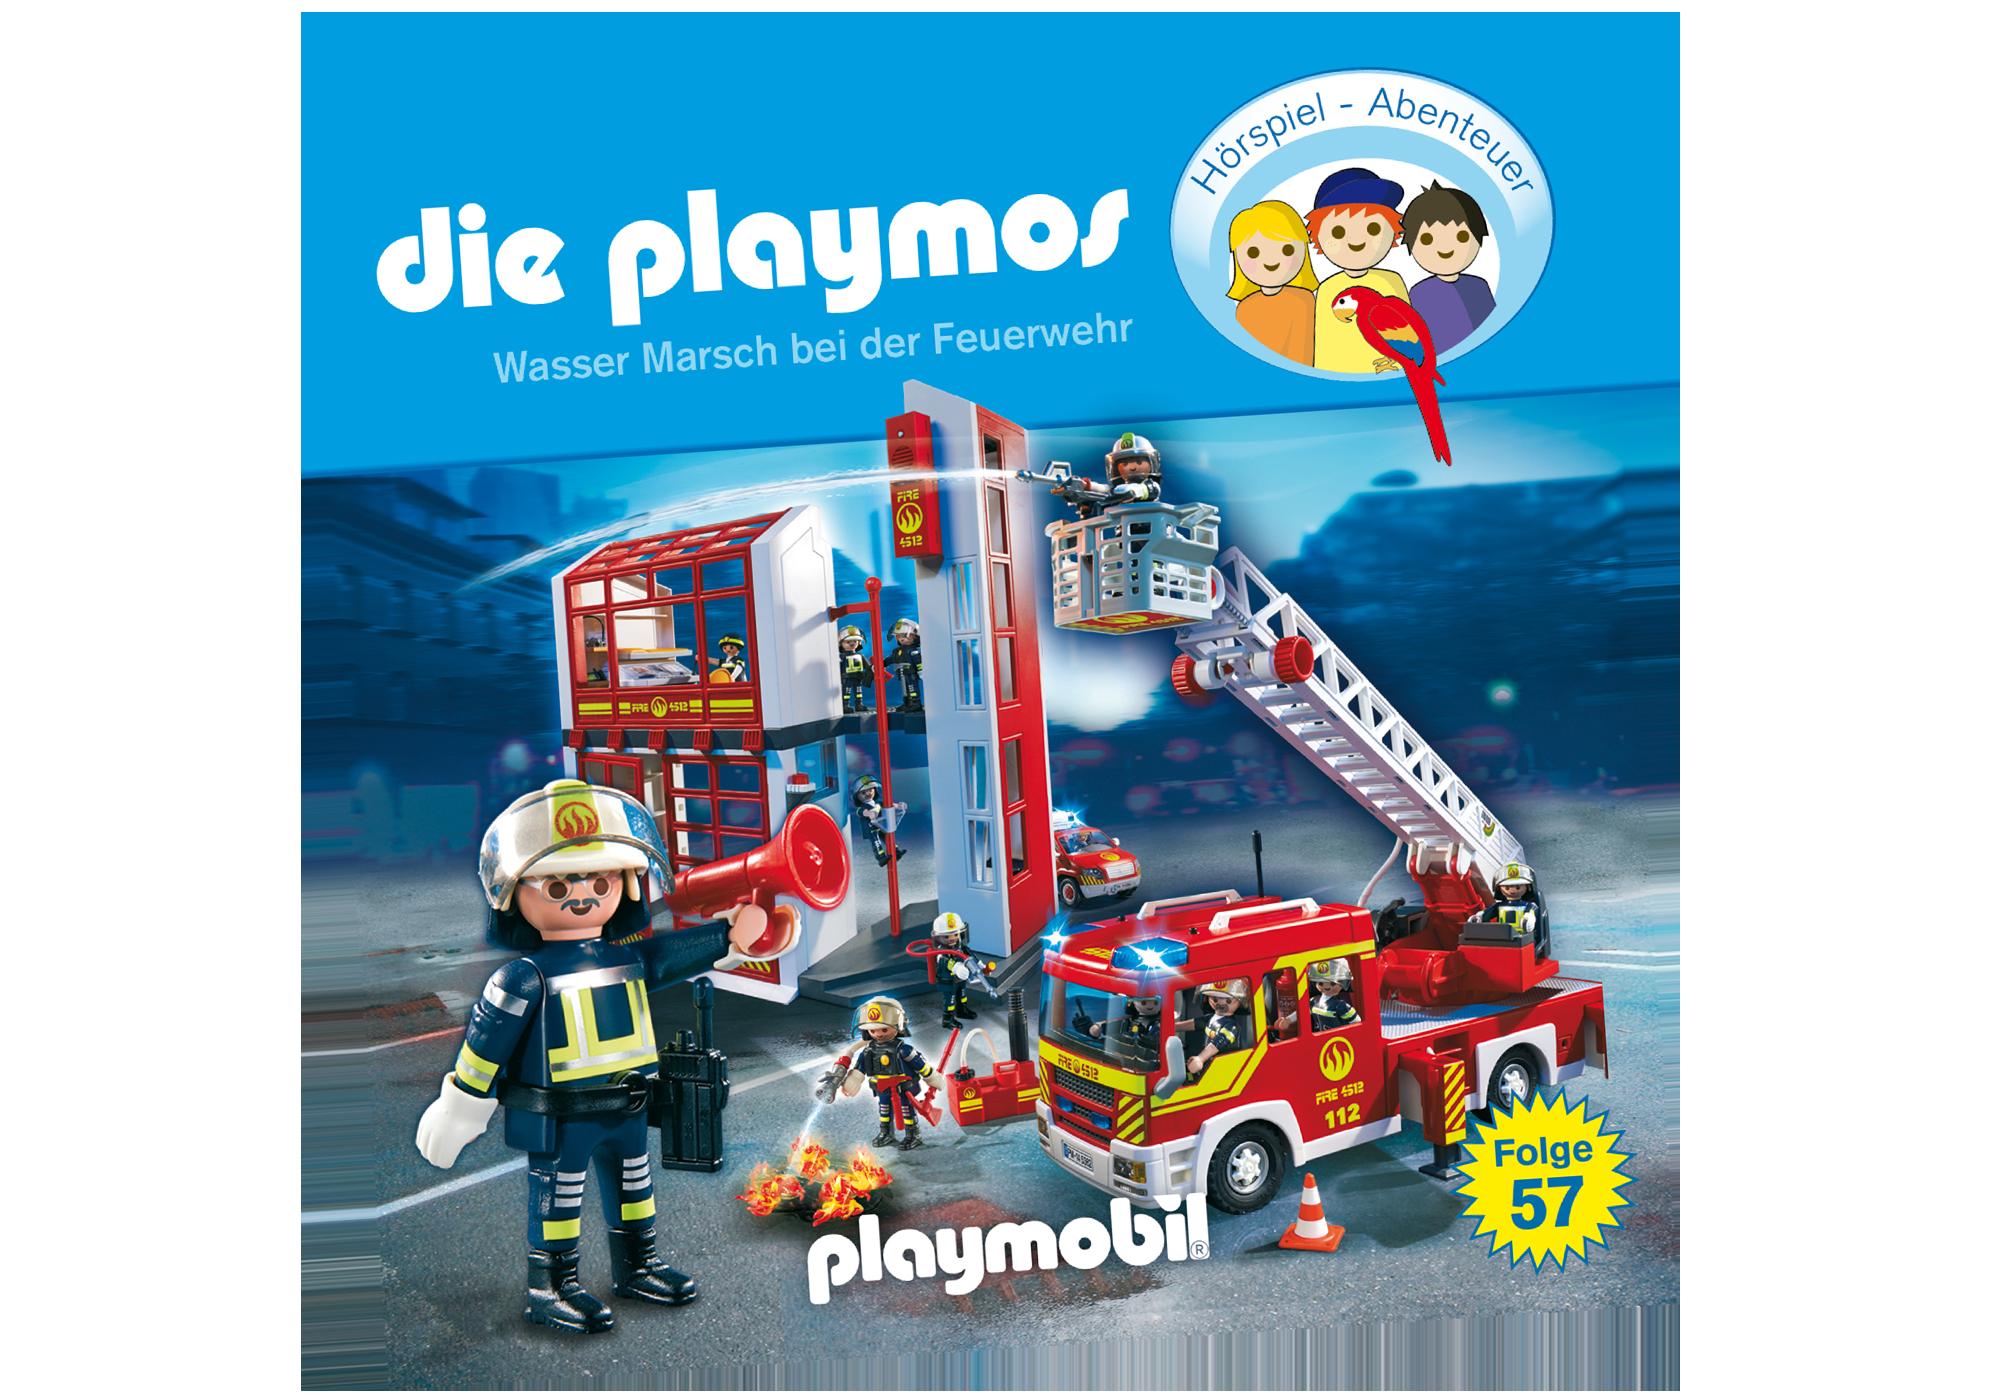 http://media.playmobil.com/i/playmobil/80009_product_detail